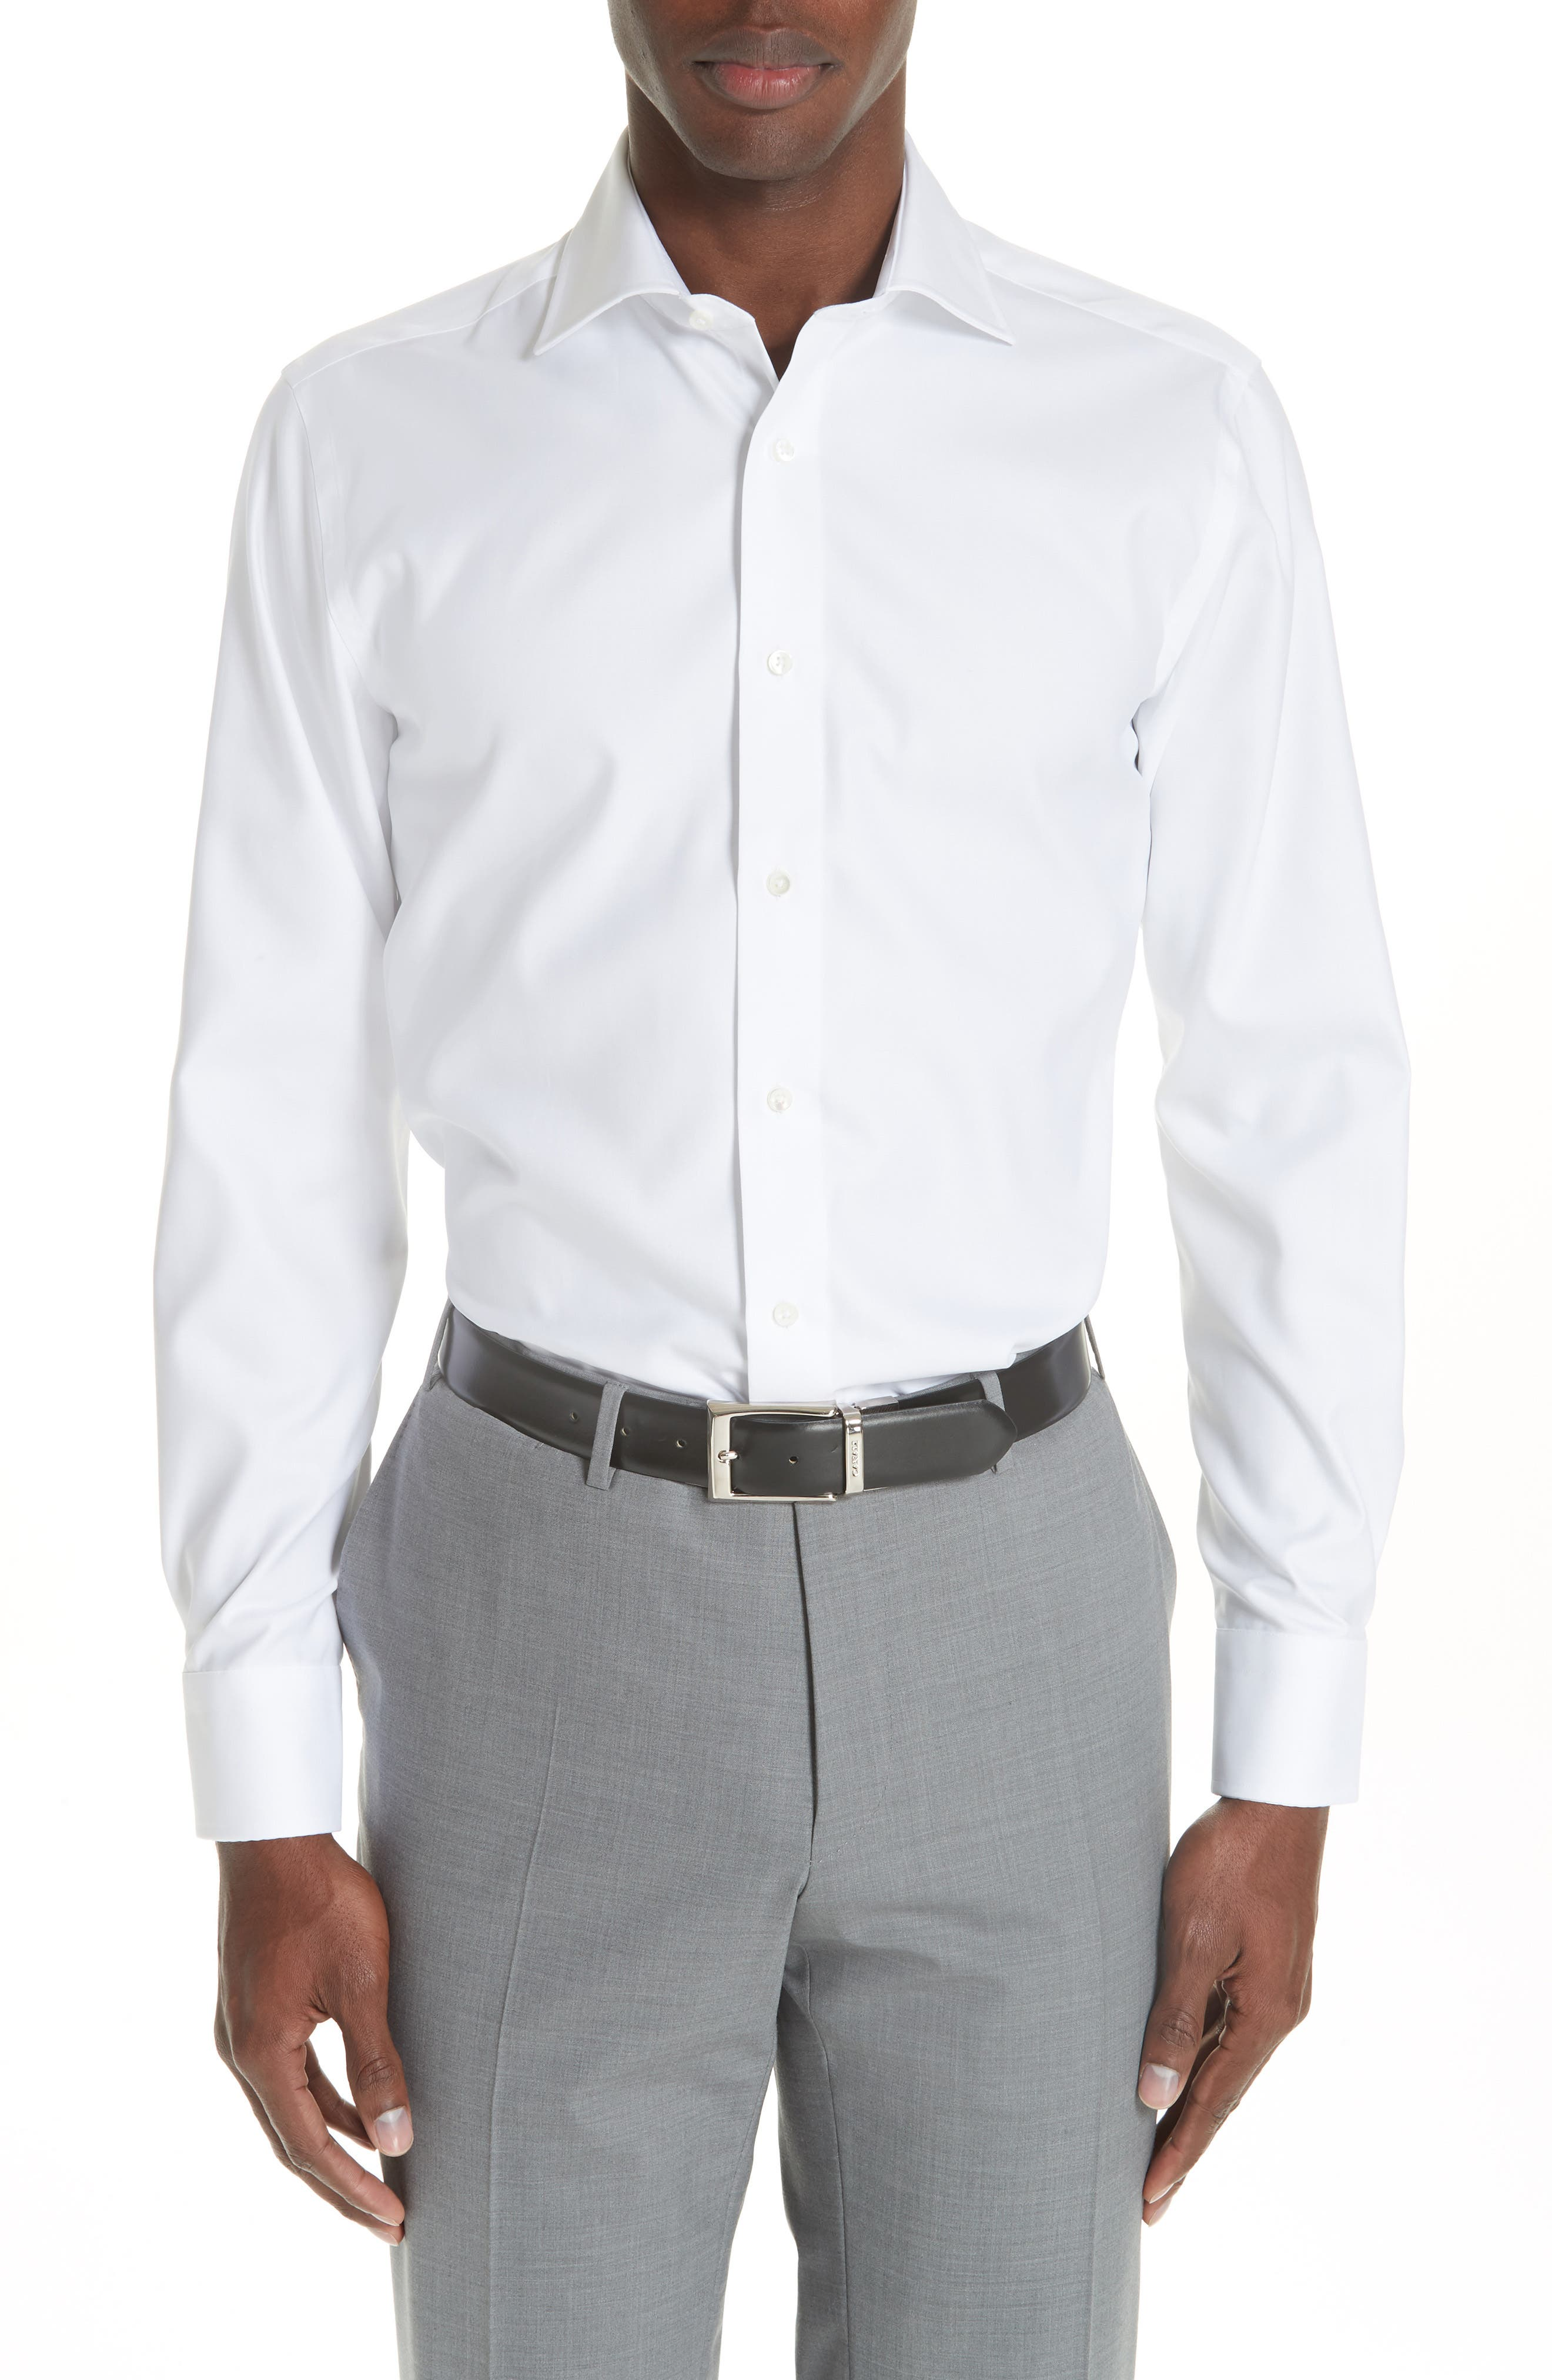 Regular Fit Solid Dress Shirt,                             Main thumbnail 1, color,                             WHITE